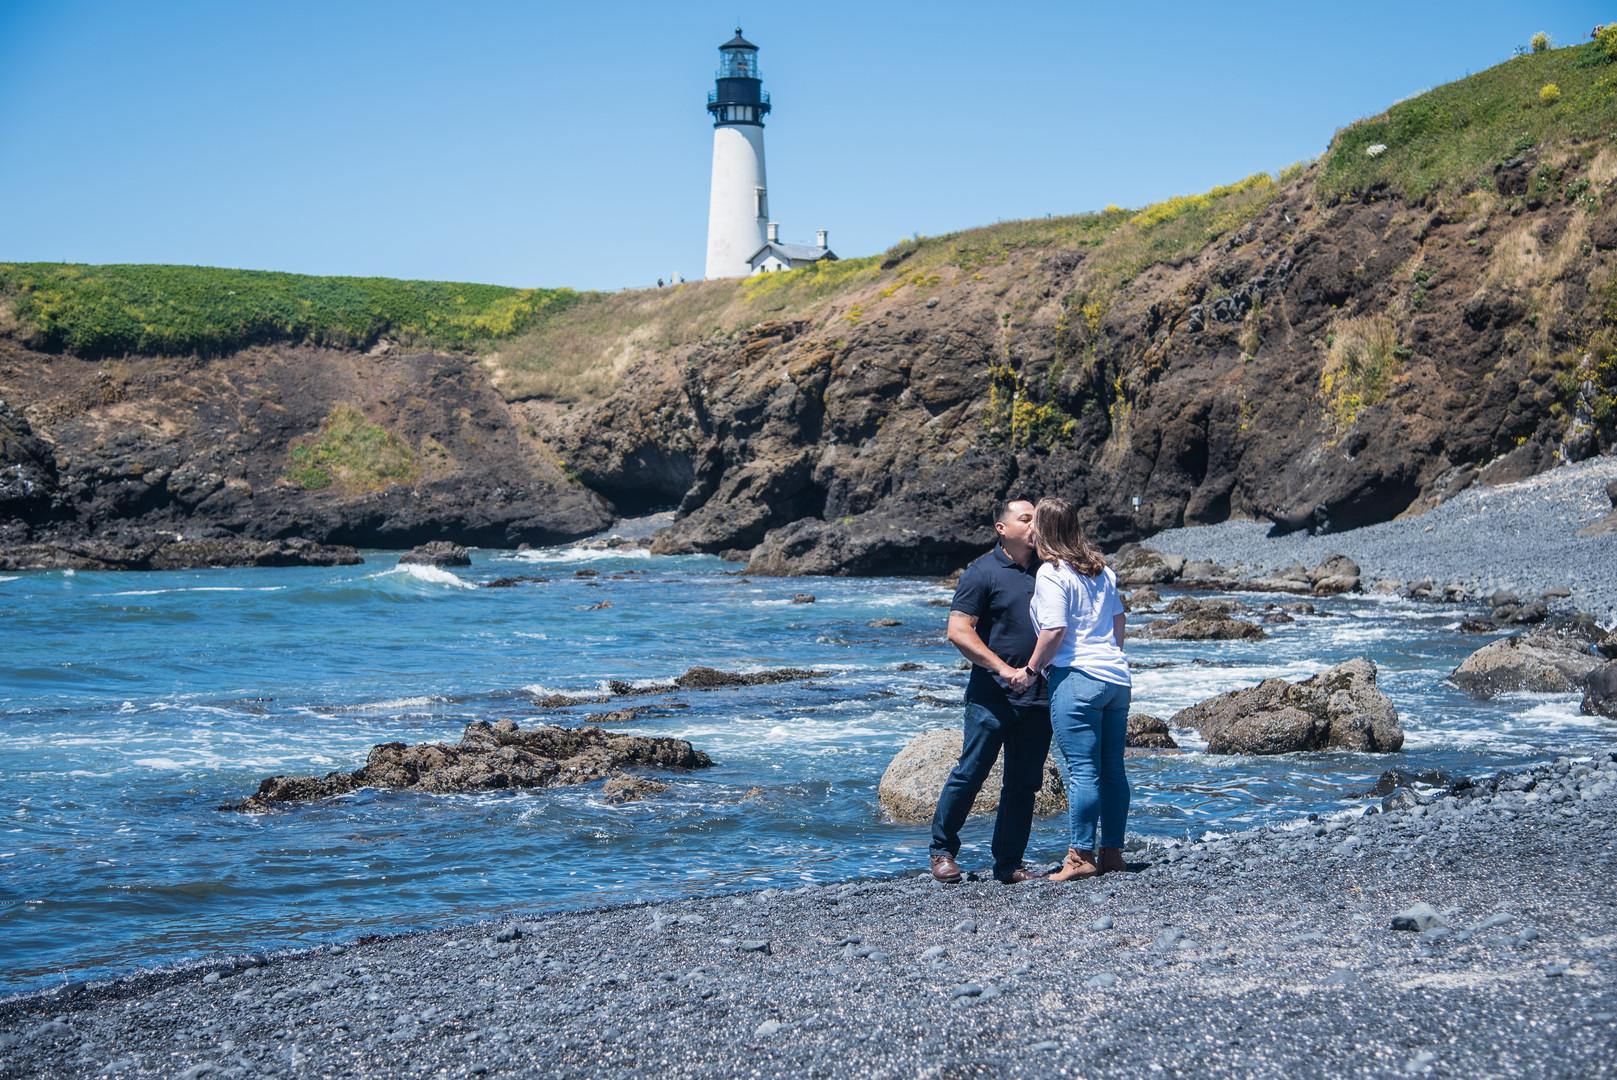 Couple at Yaquina Head Lighthouse